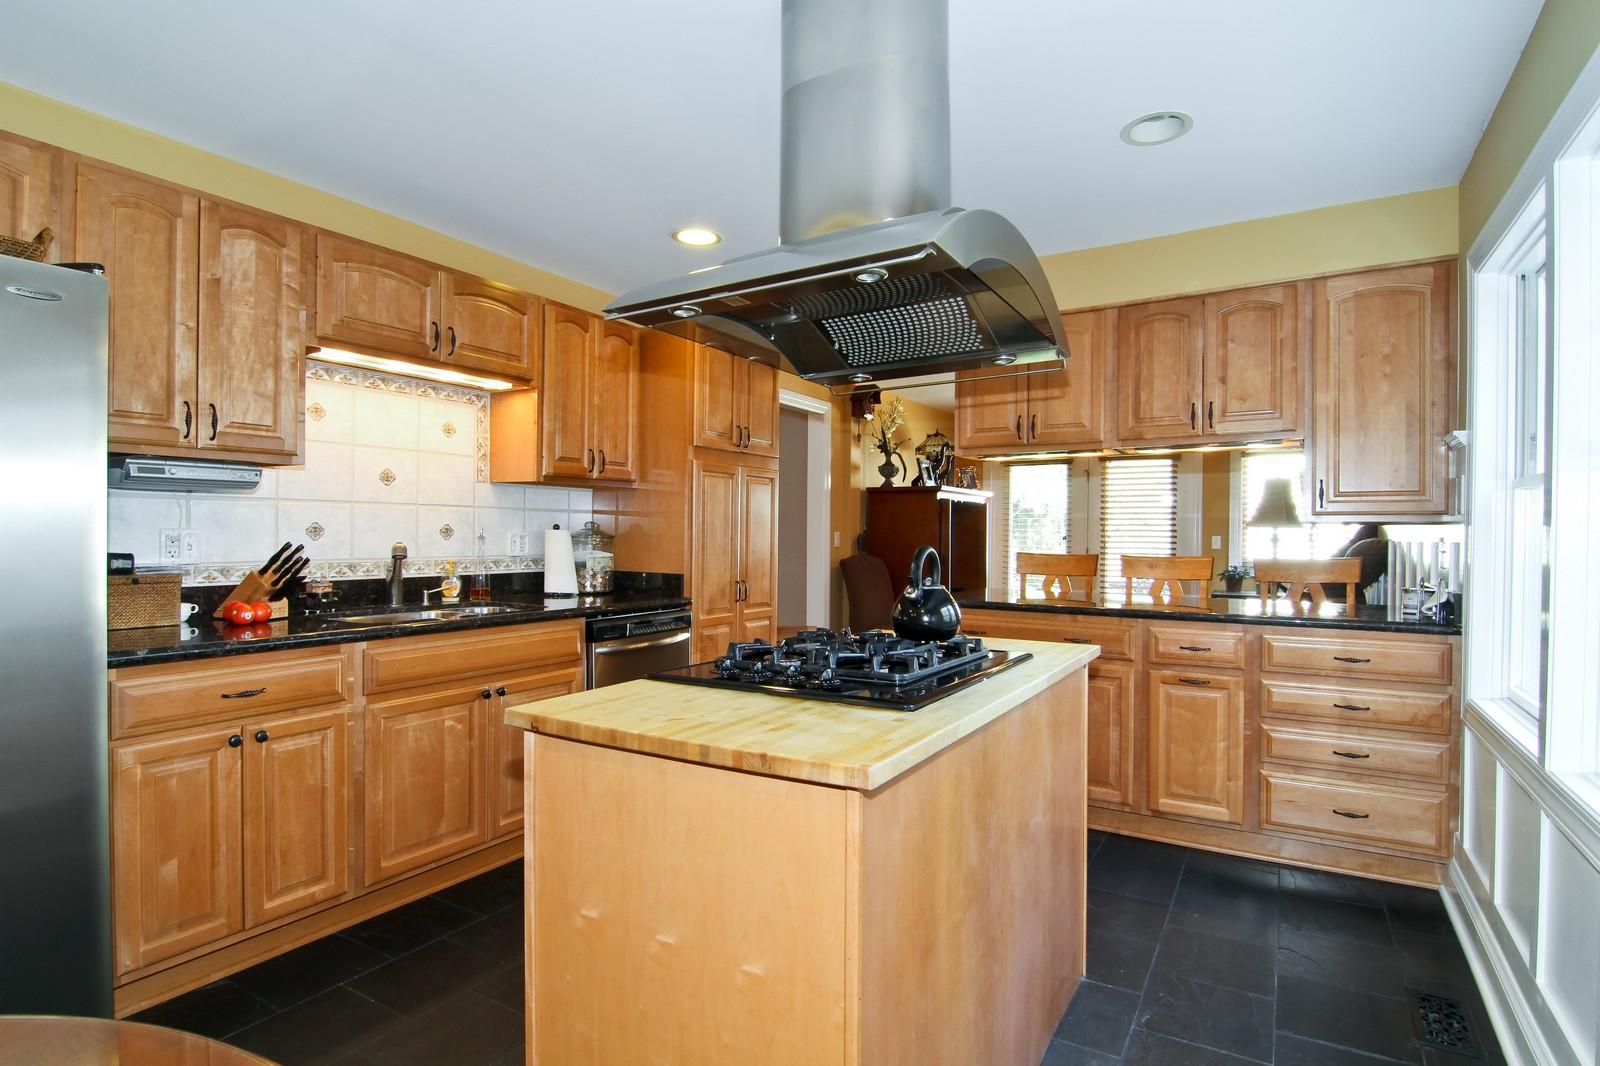 Real Estate Photography - 441 Edgewood Dr, La Grange, IL, 60525 - Kitchen